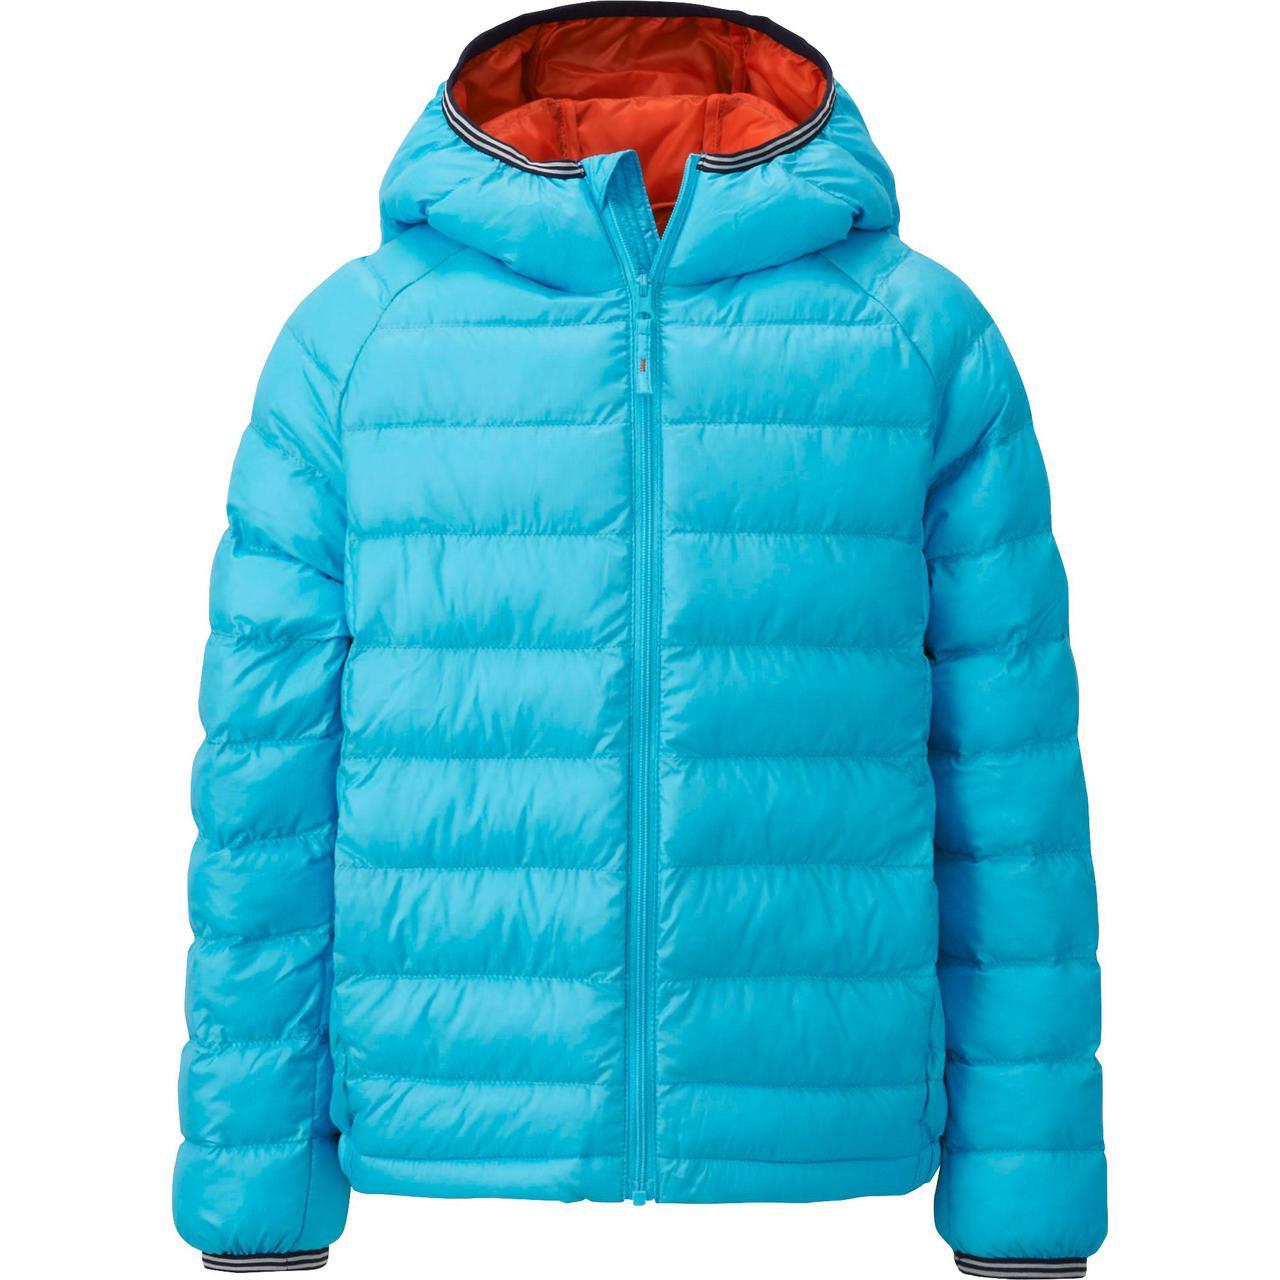 Куртка Uniqlo boys light warm padded parka BLUE64